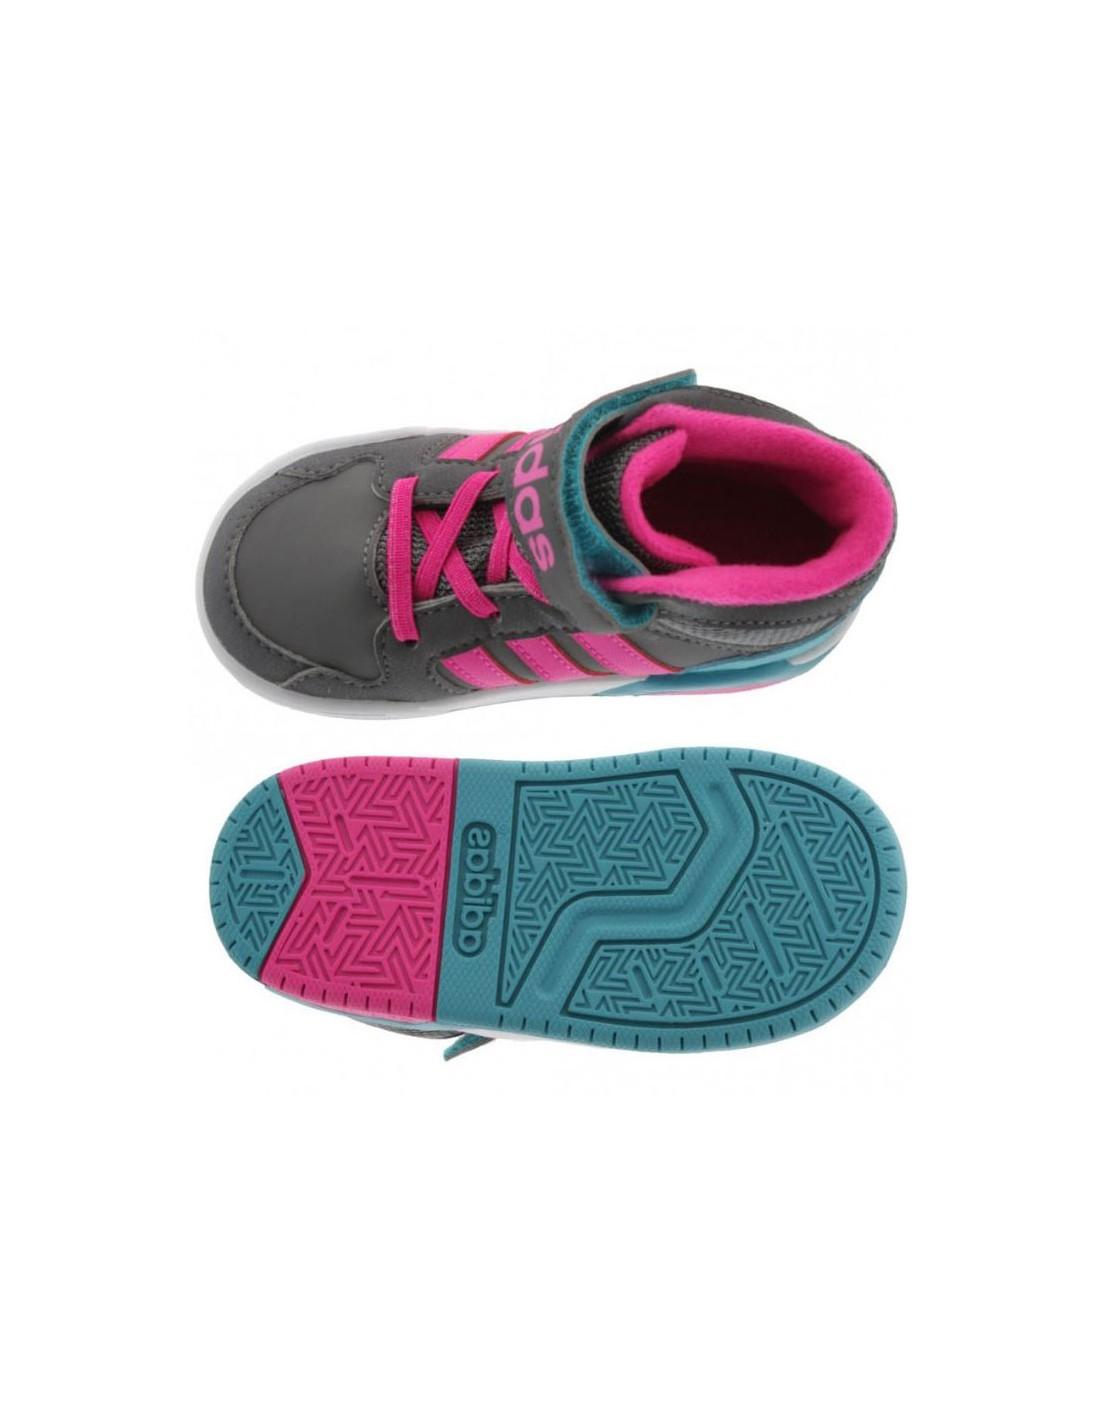 outlet store 38066 34395 primi fucsia Neo Scarpe passi Adidas bambina 4qSwft